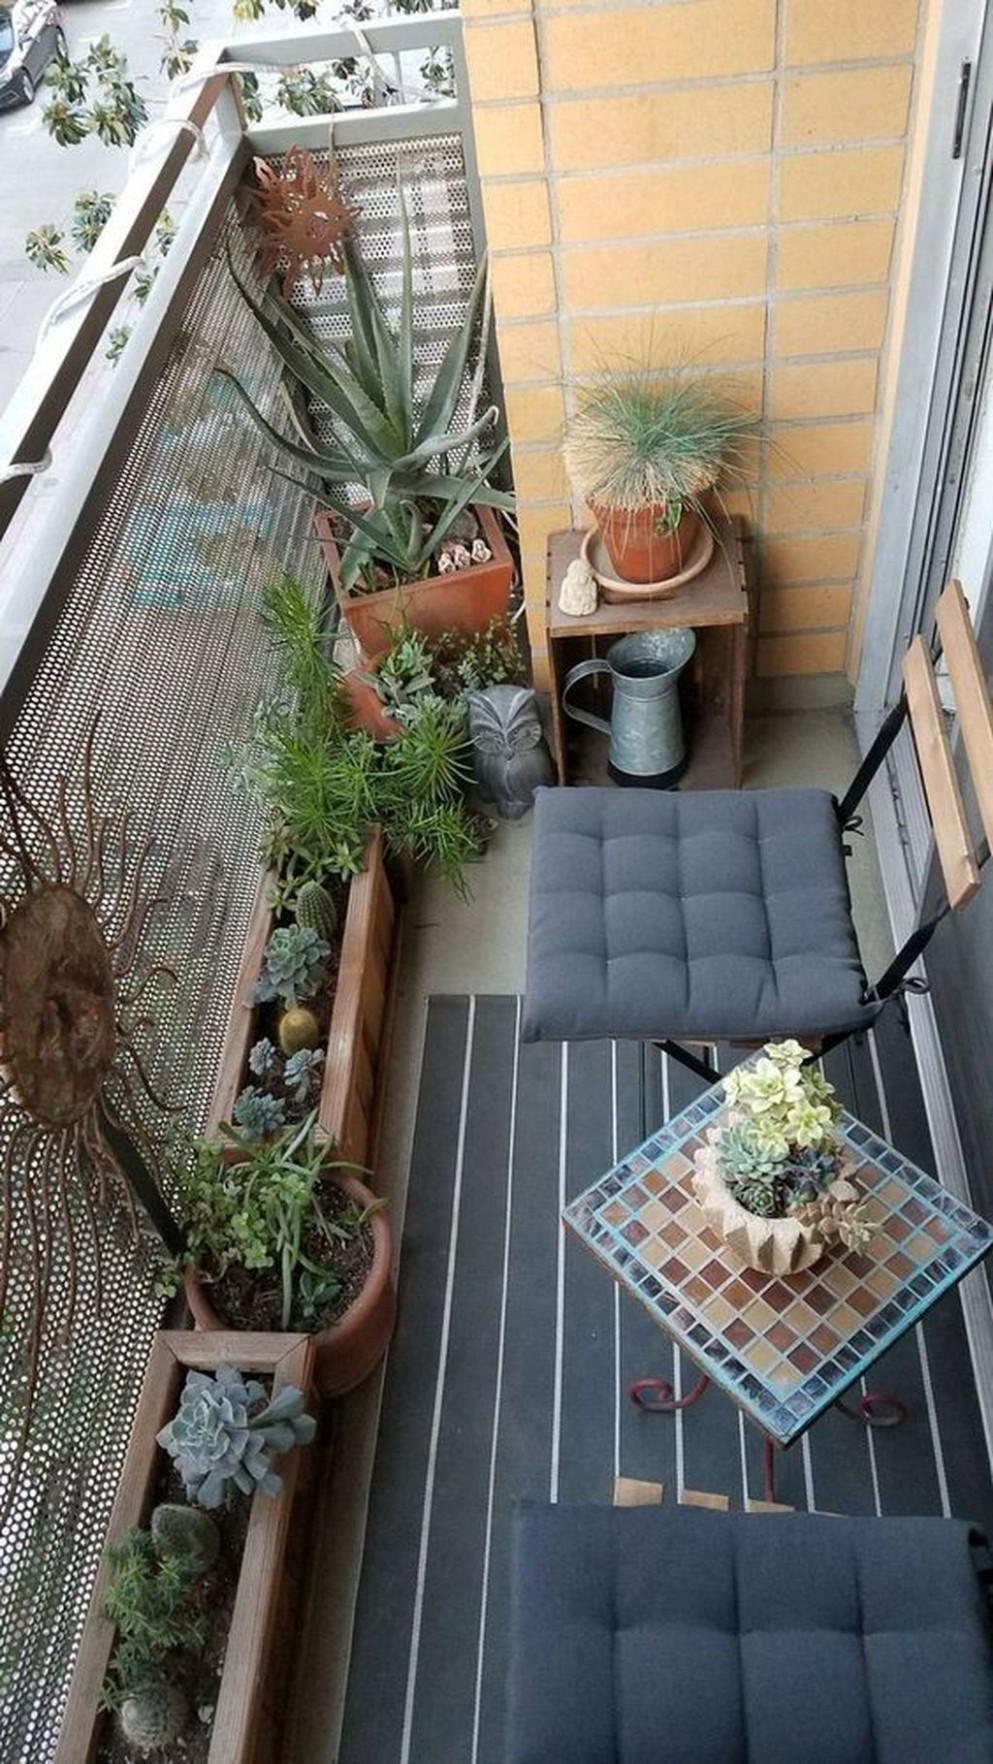 11 Beautiful Apartment Balcony Decorating Ideas in 11  Small  - Apartment Balcony Decorating Ideas You